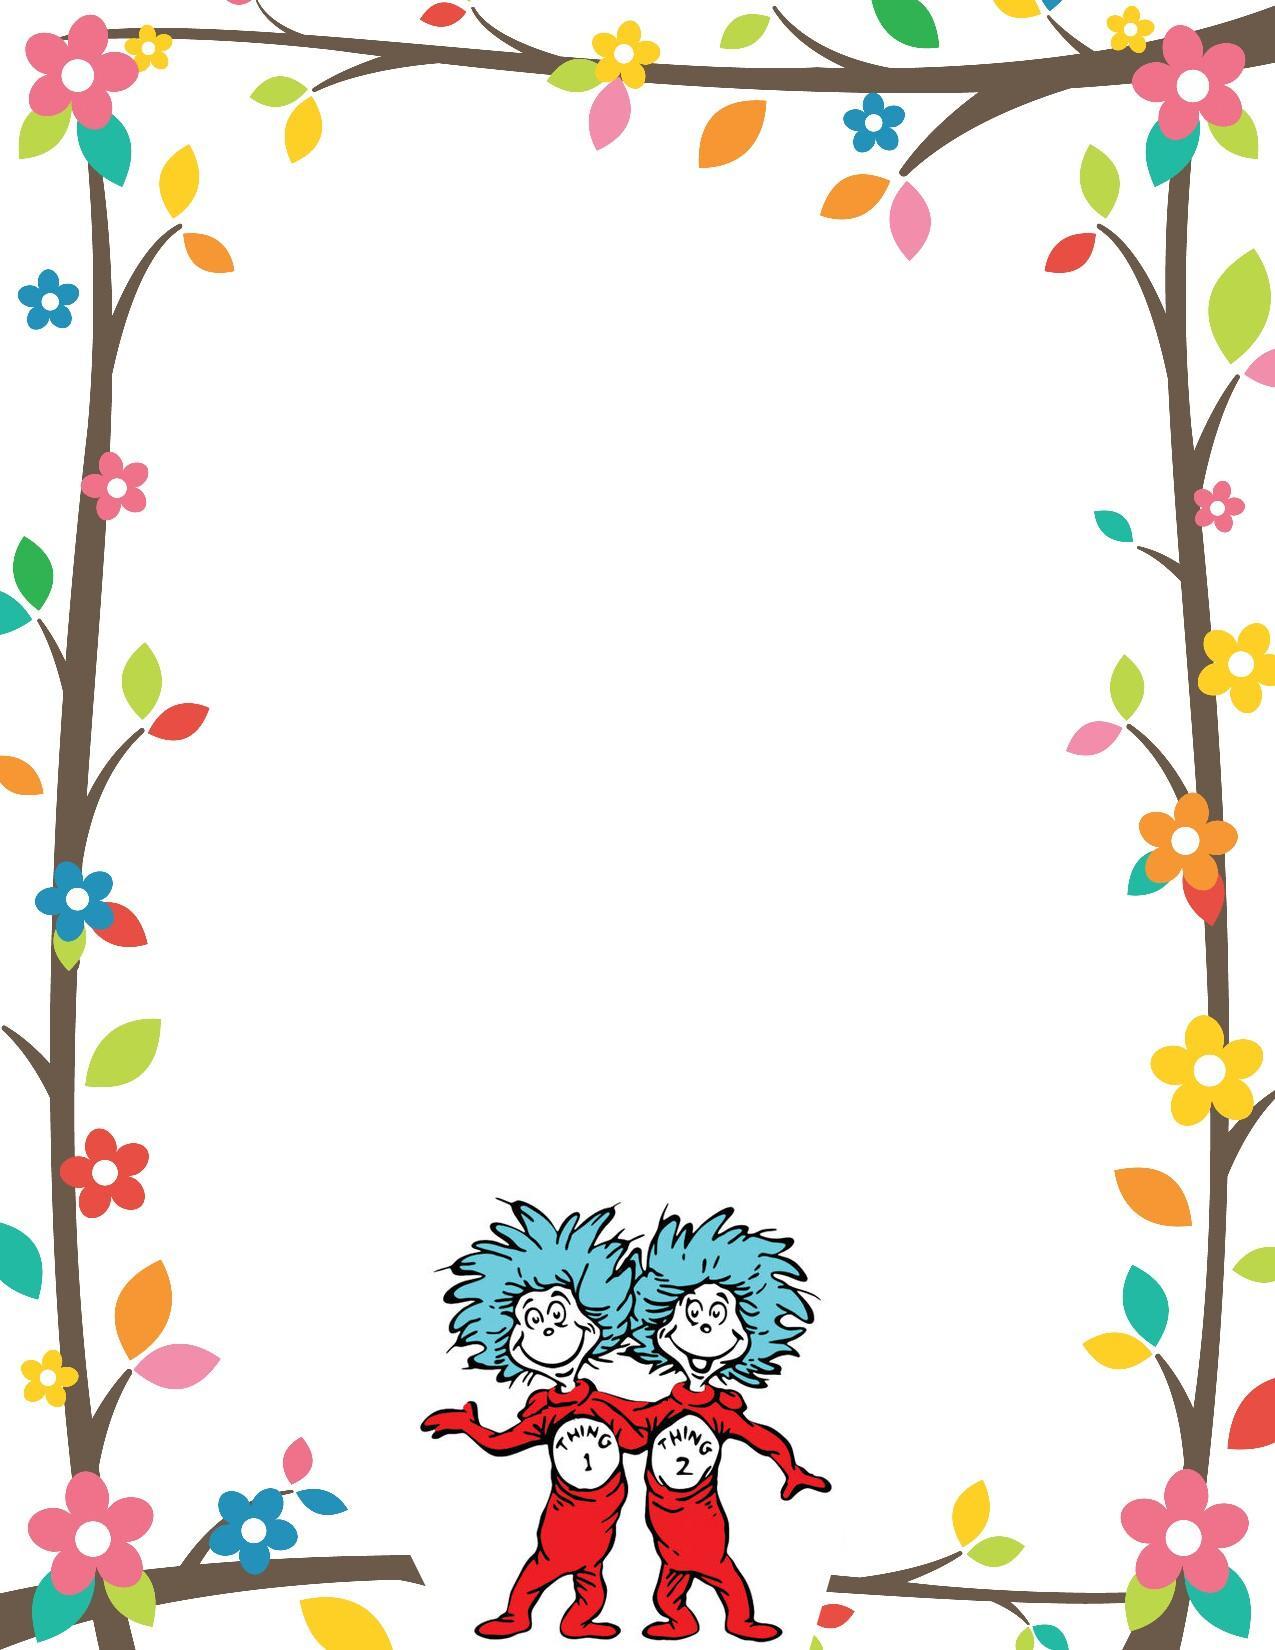 Cute Paw Print Wallpaper Dr Seuss Border Invitation Free Print